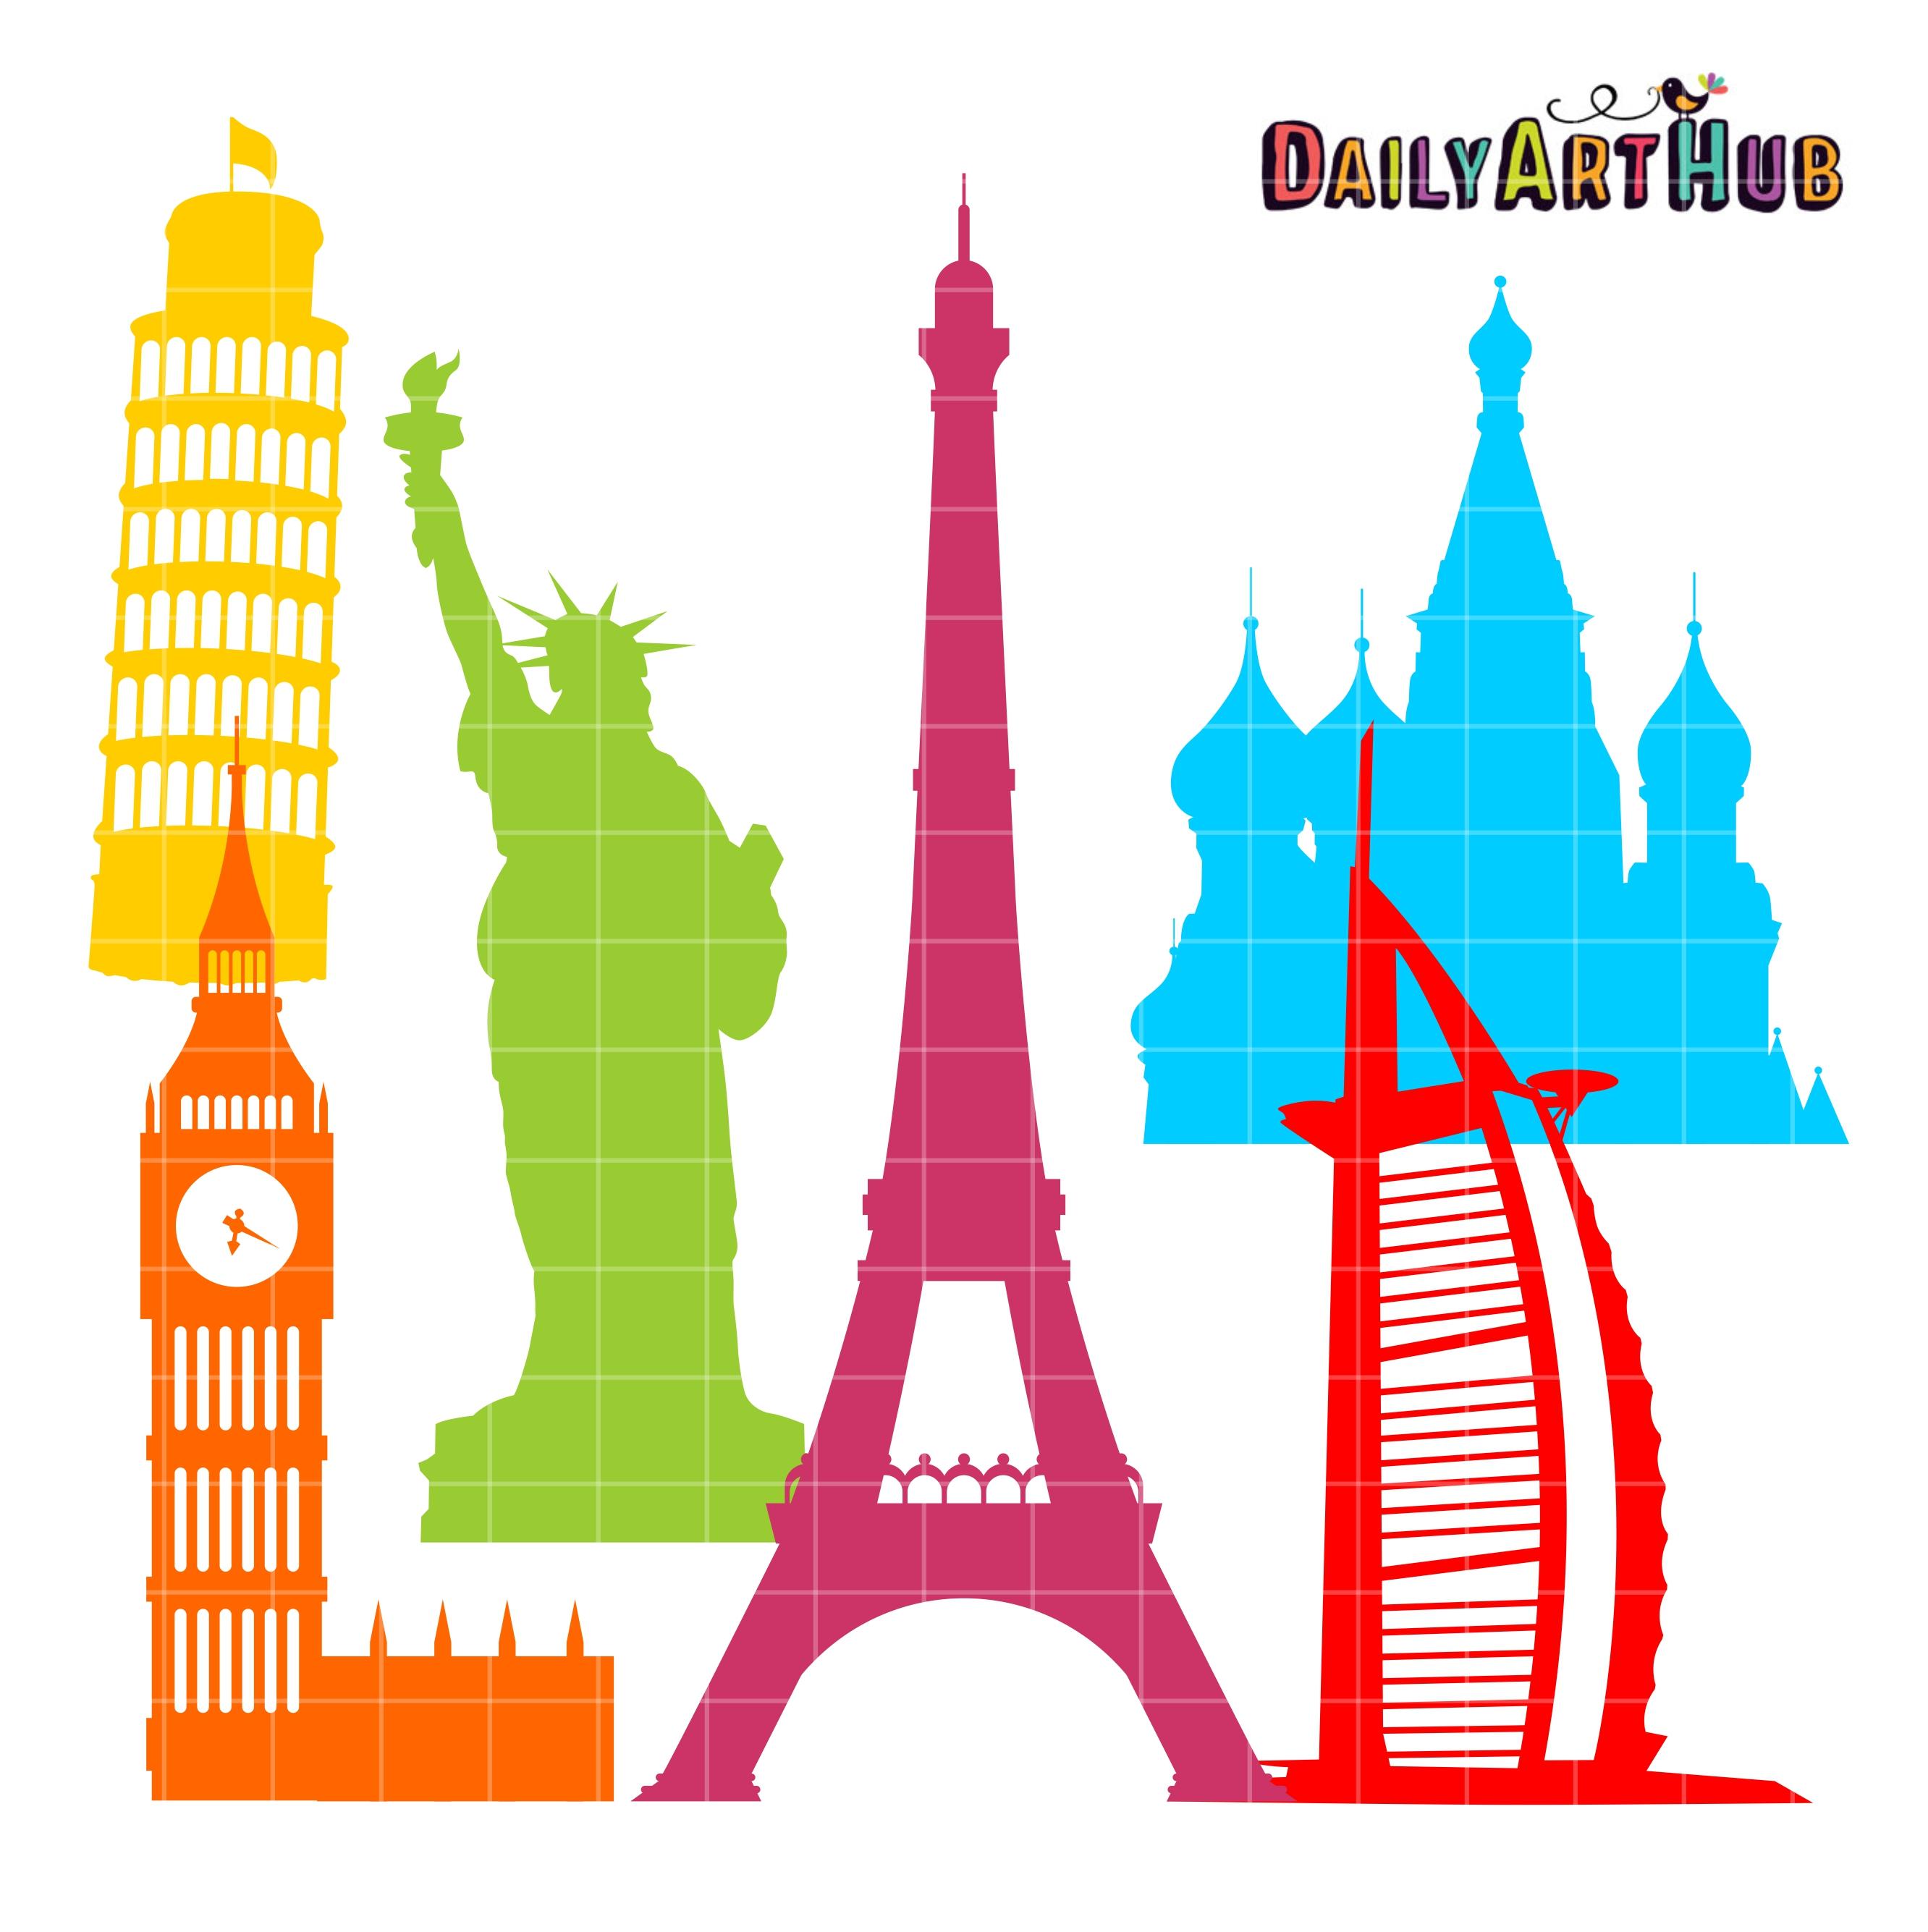 2664x2670 World Landmarks Silhouettes Clip Art Set Daily Art Hub Free